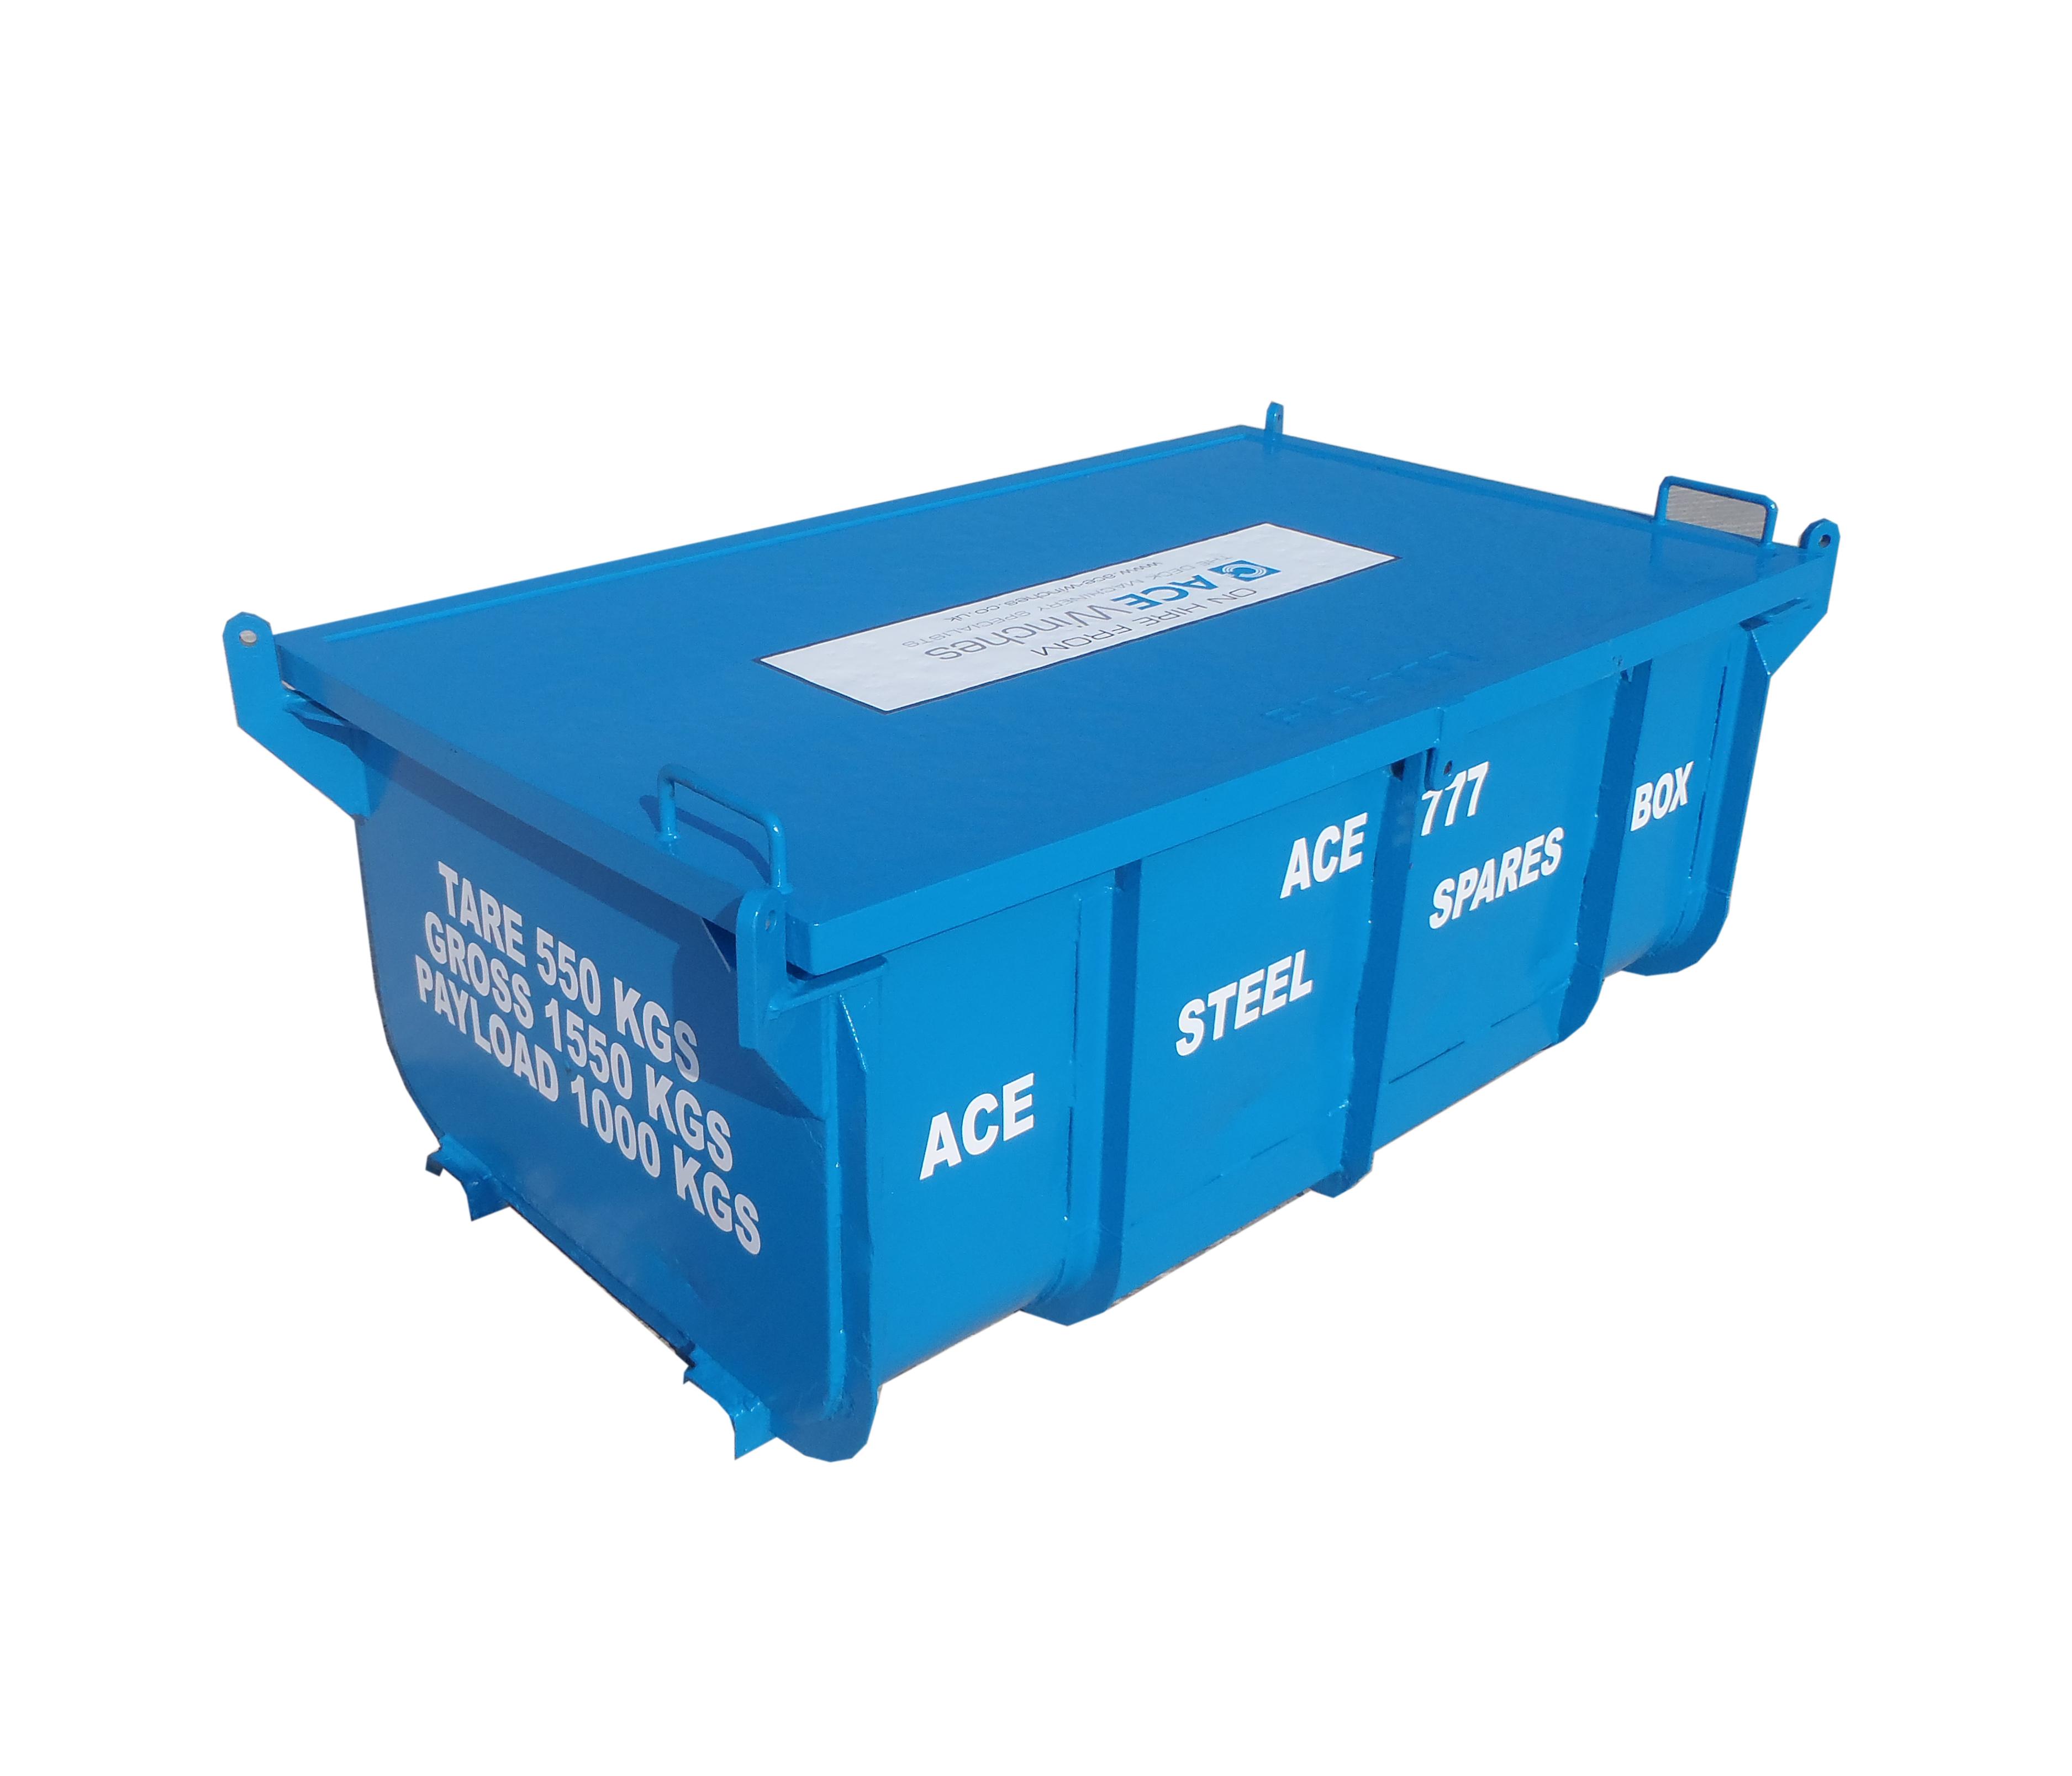 ACE Steel Transport Box